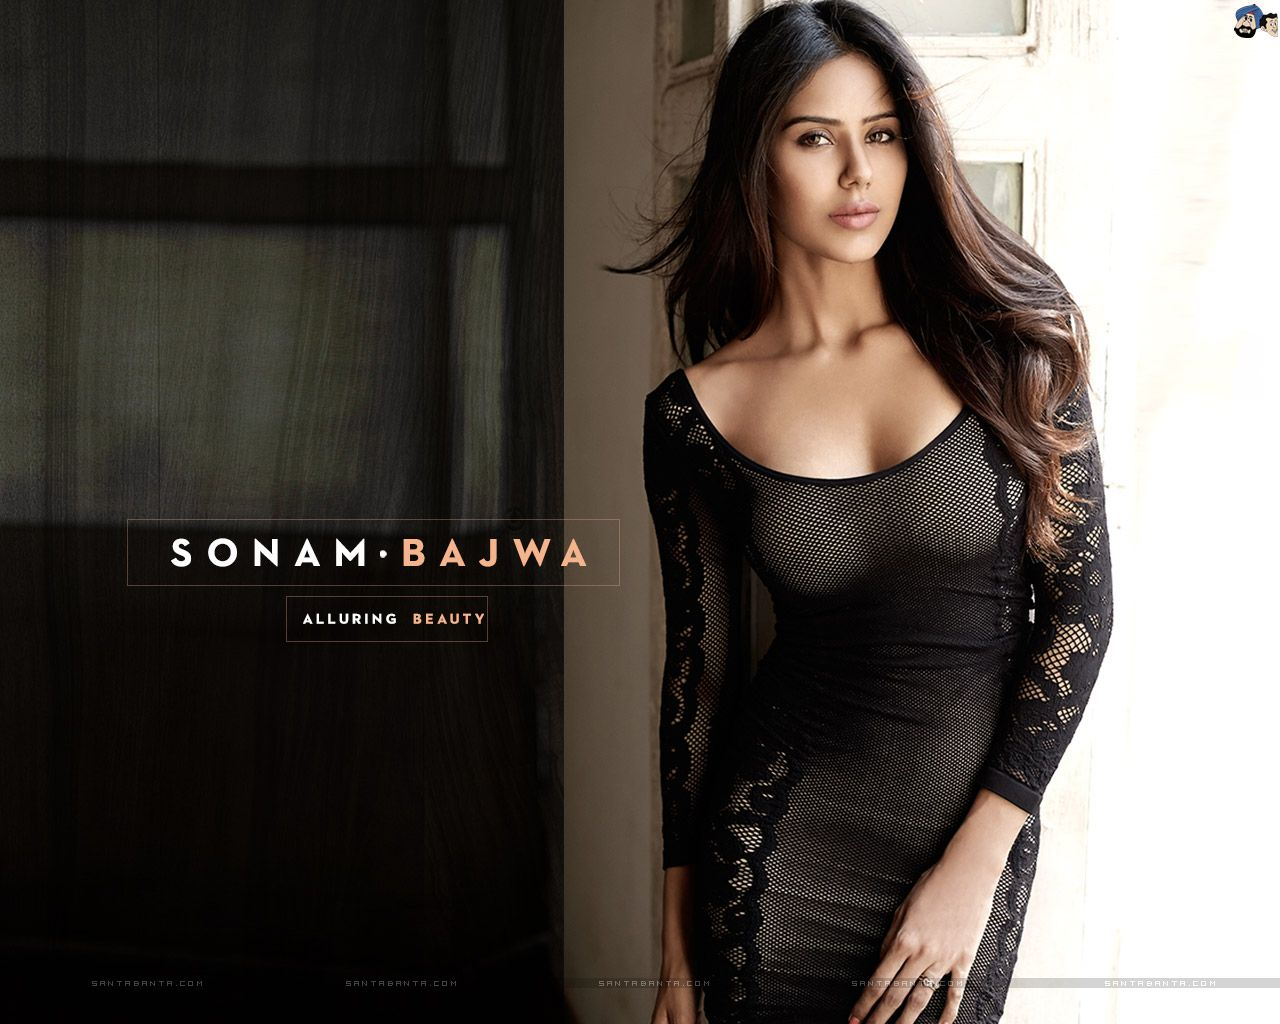 xxx Sonam bajwa